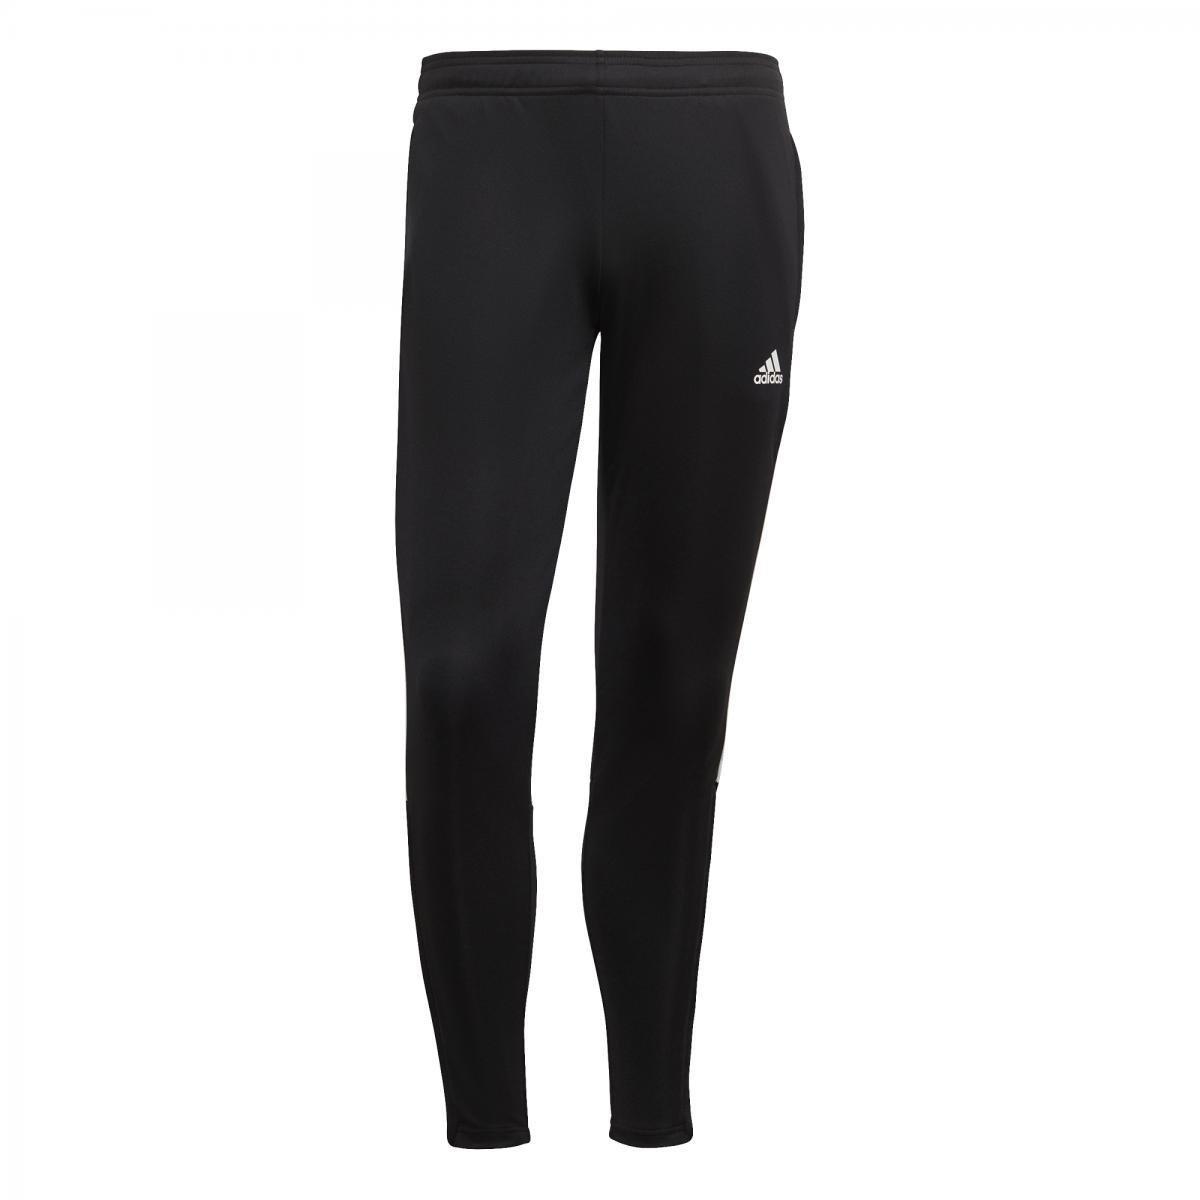 Adidas  Tiro21 Tr Pnt W, joggebukse, dame